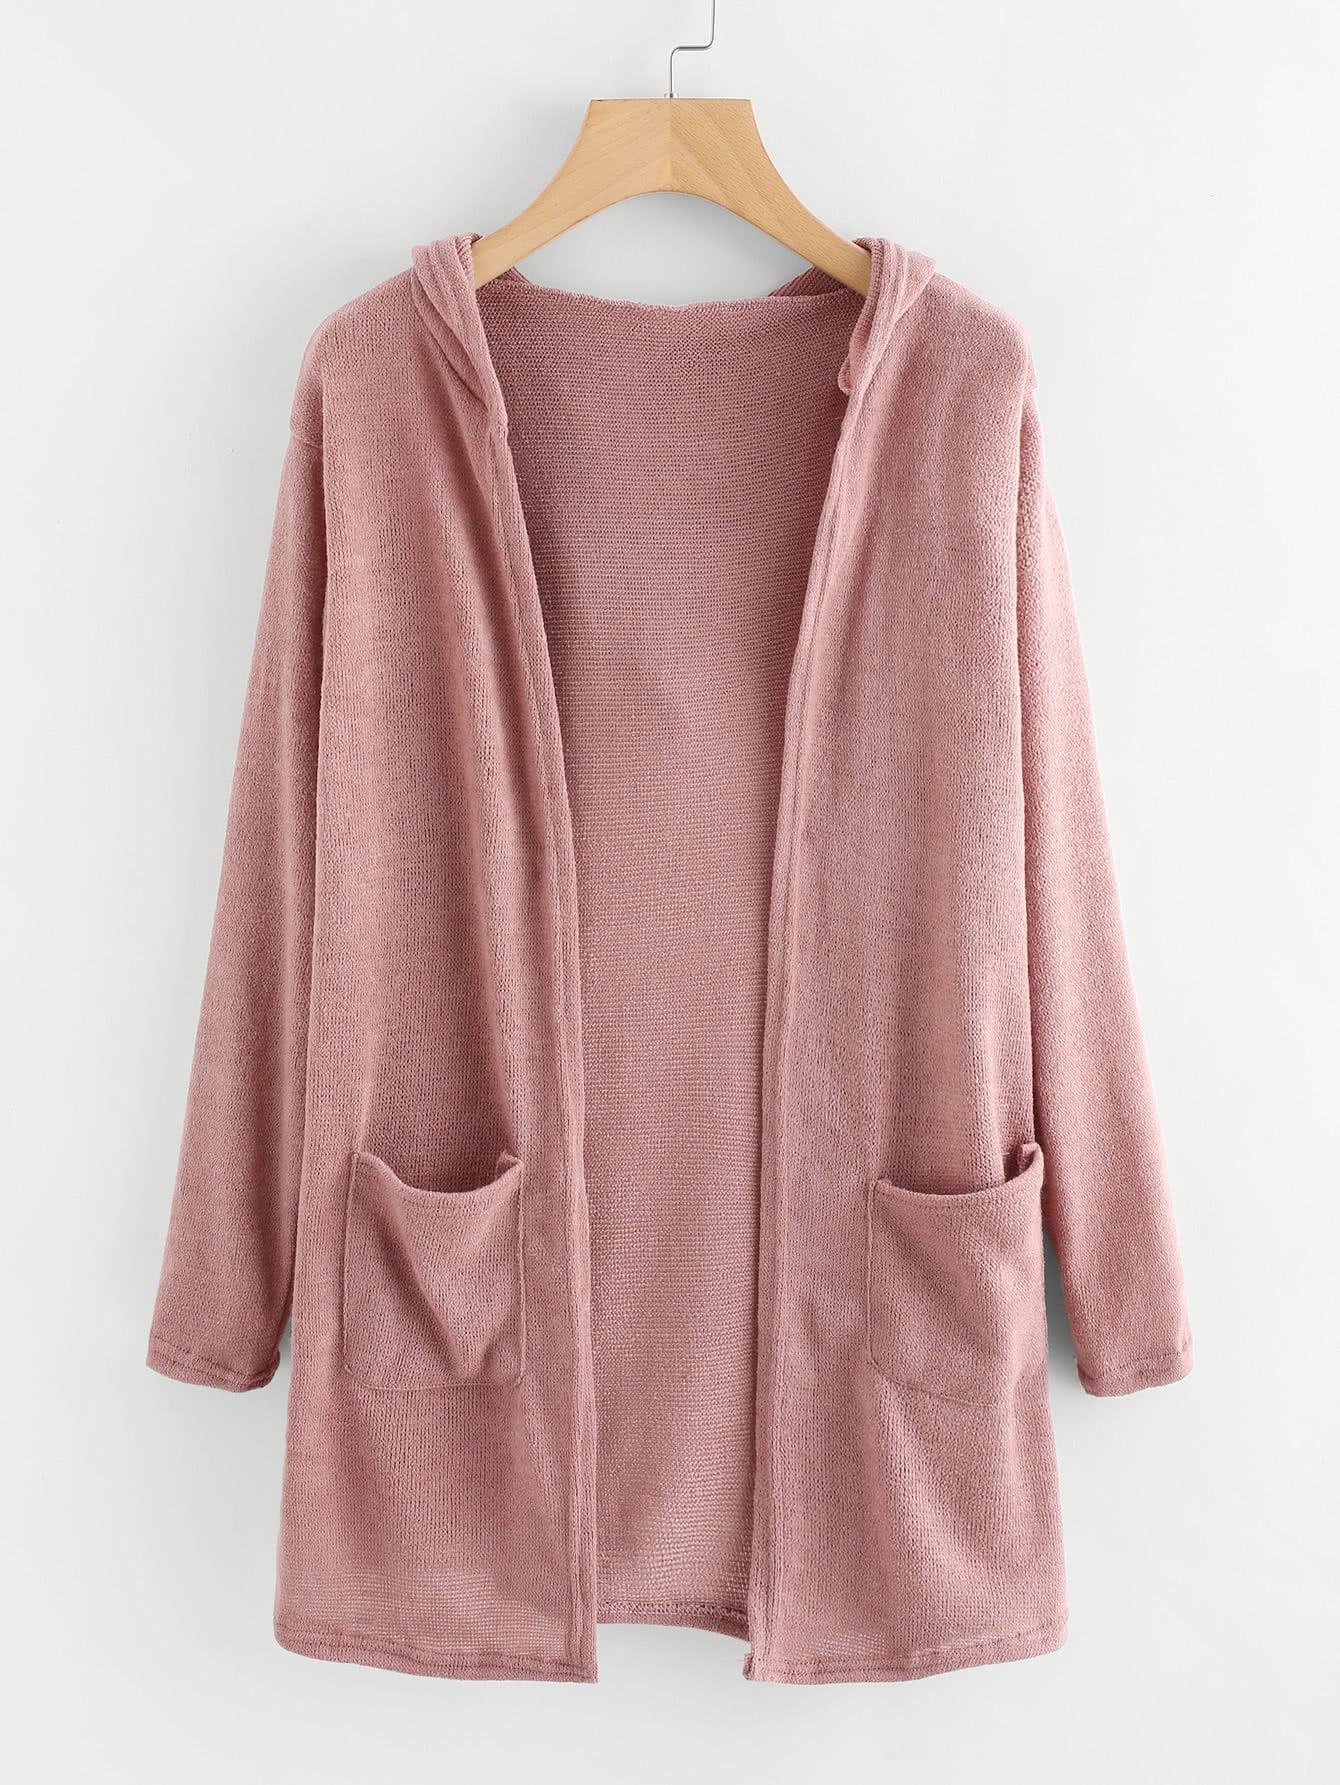 Dolman Sleeve Ribbed Jumper sweater171017170